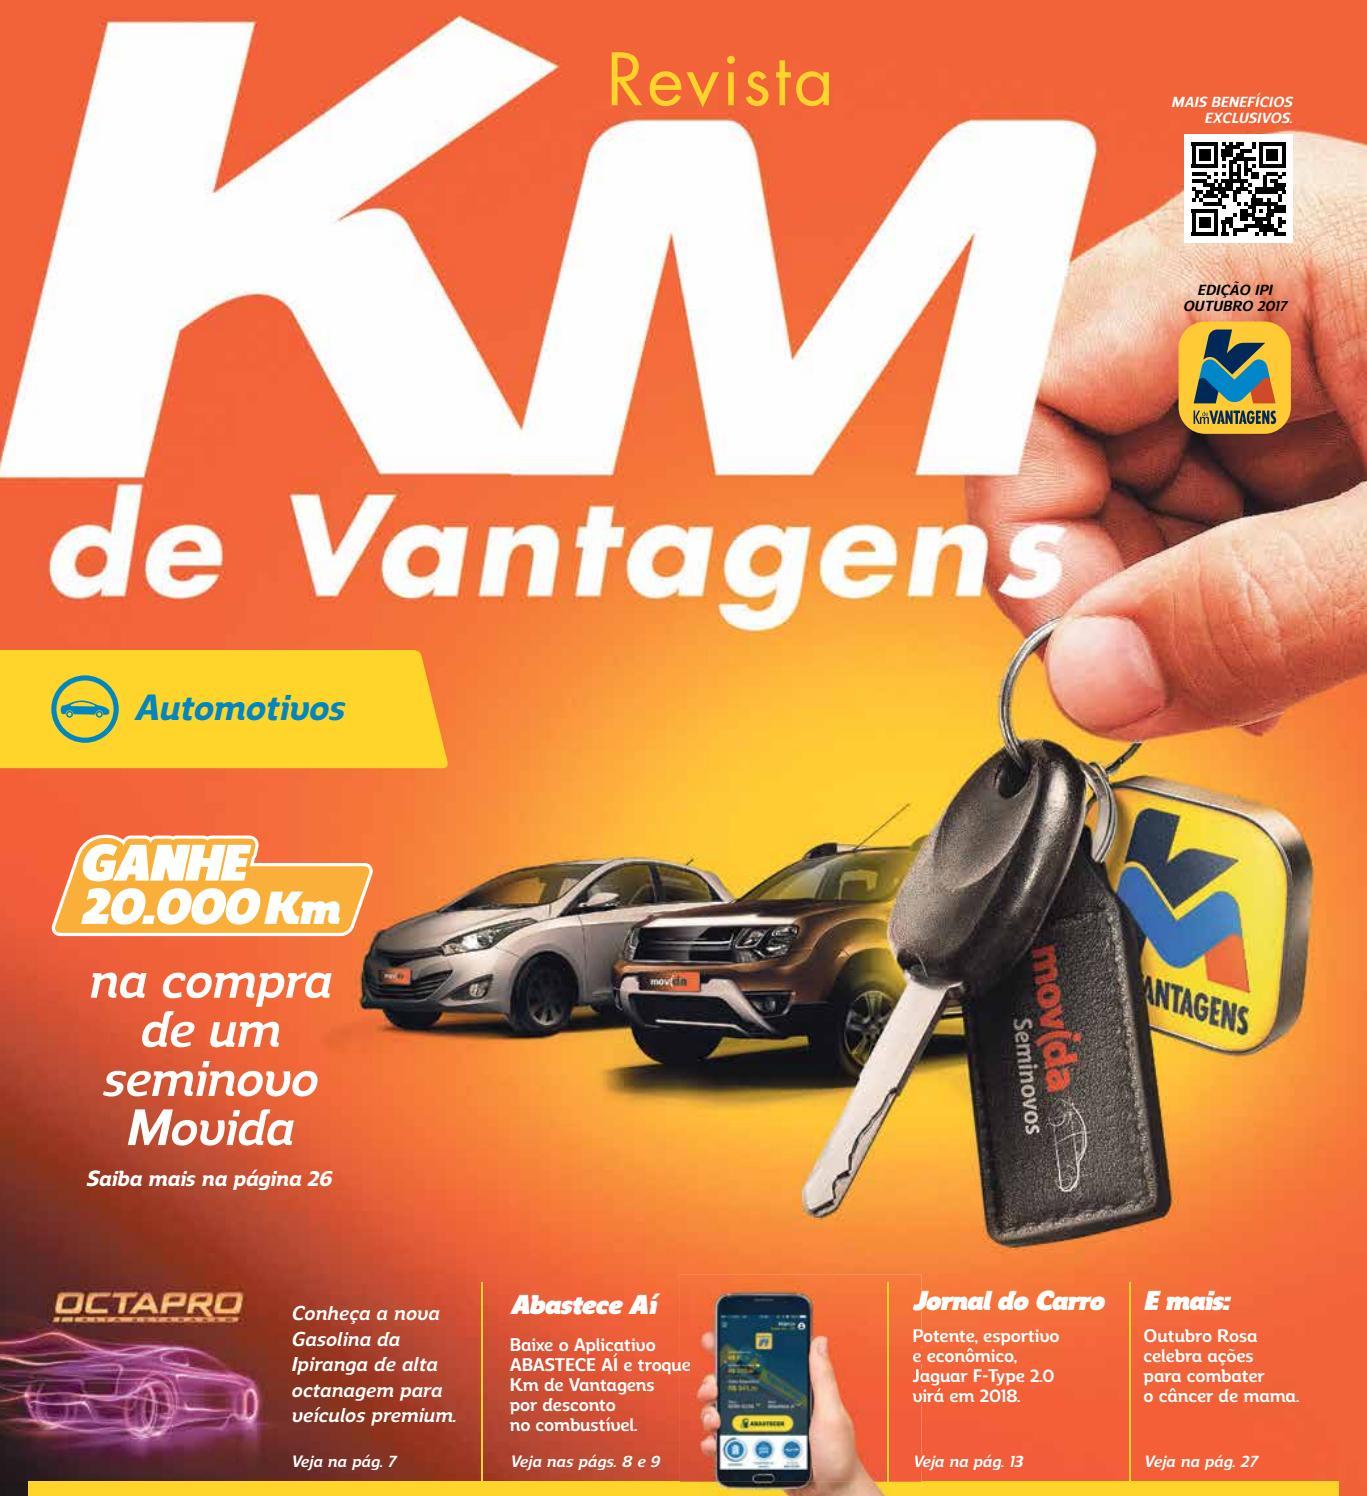 41c14df05 Ipi by Km de Vantagens - issuu